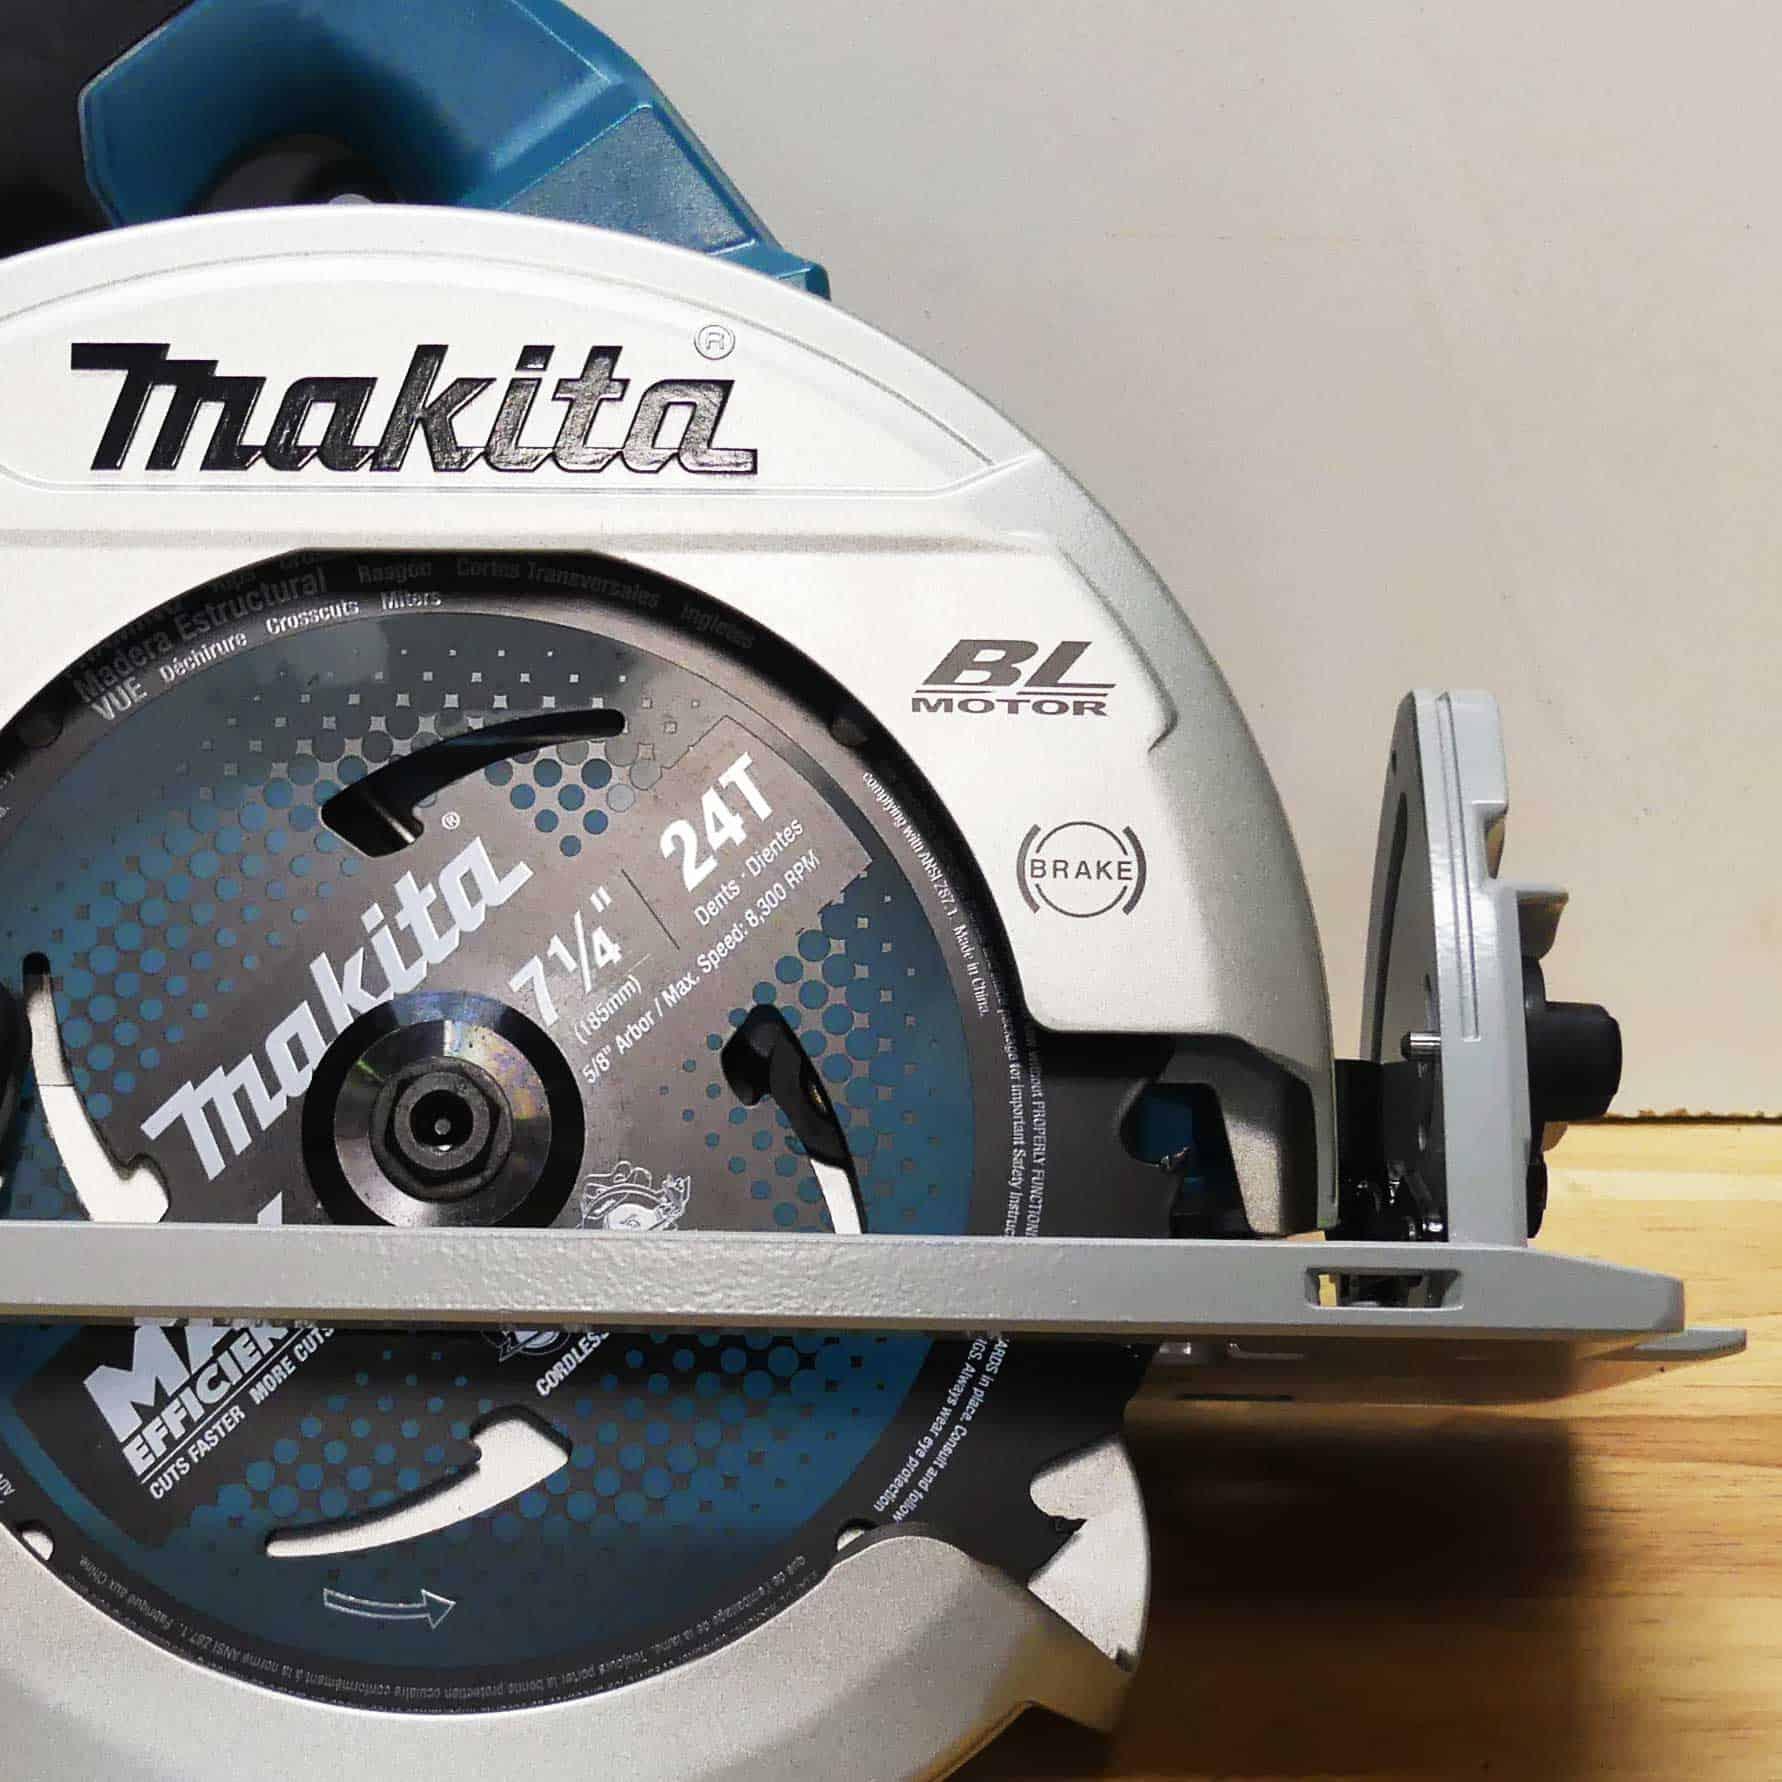 Makita Circular Saws Get More Compact With The XSH06 And